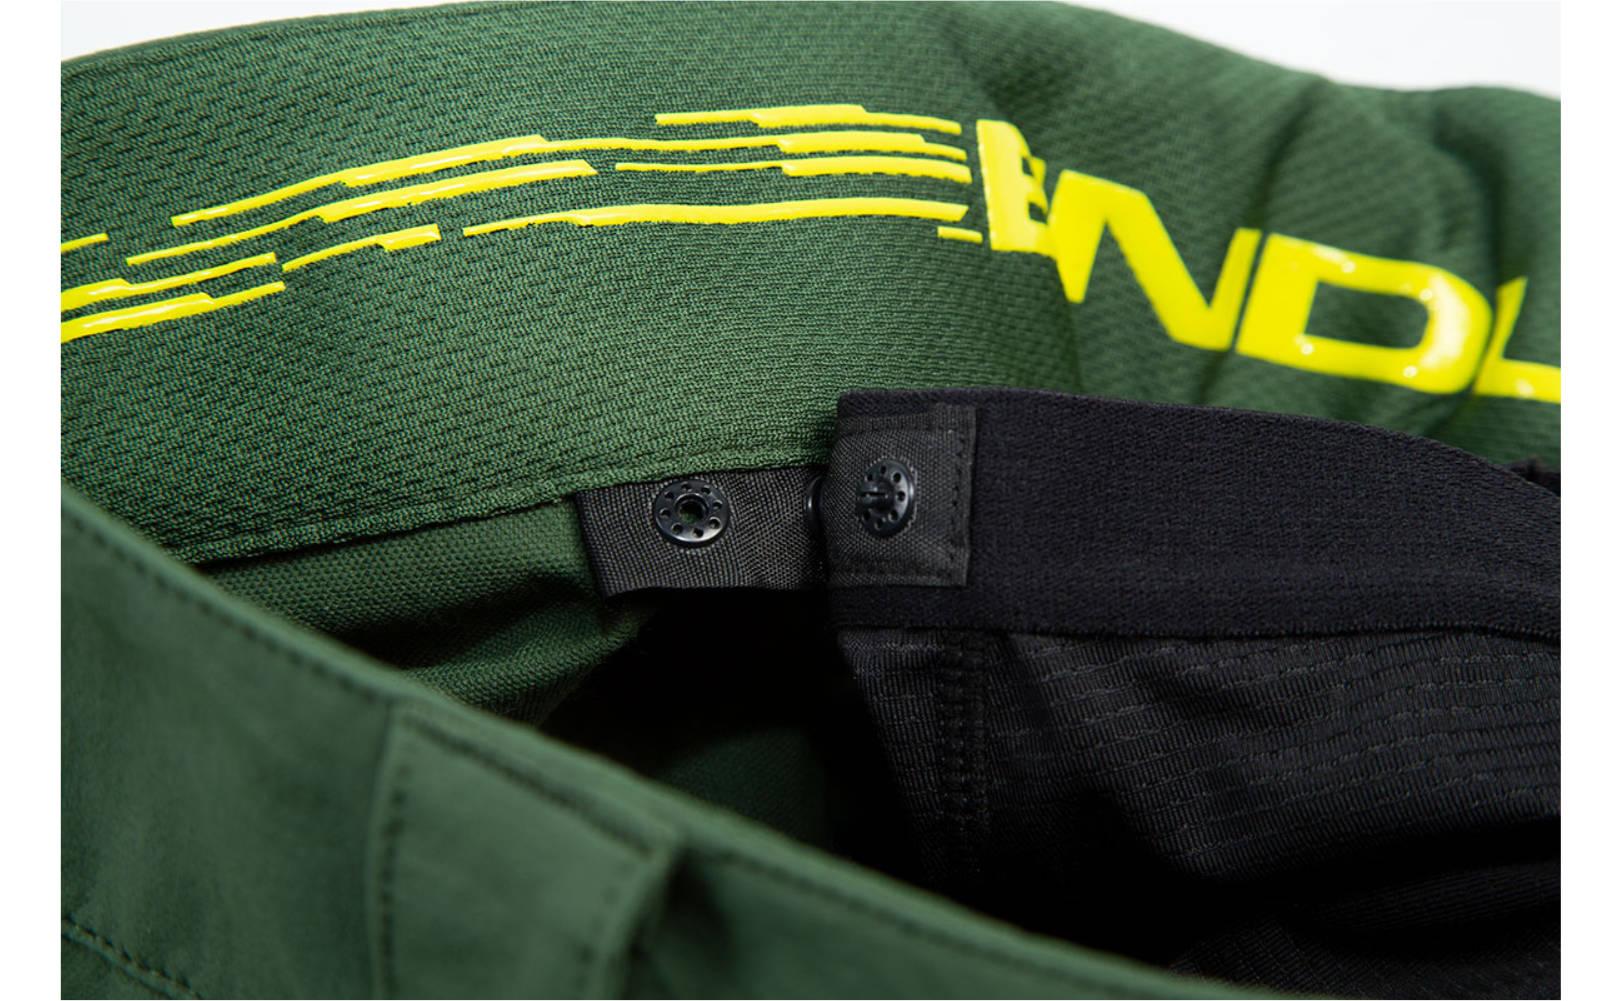 Endura SingleTrack II Trouser in Forest Green - Inside Clickfast System